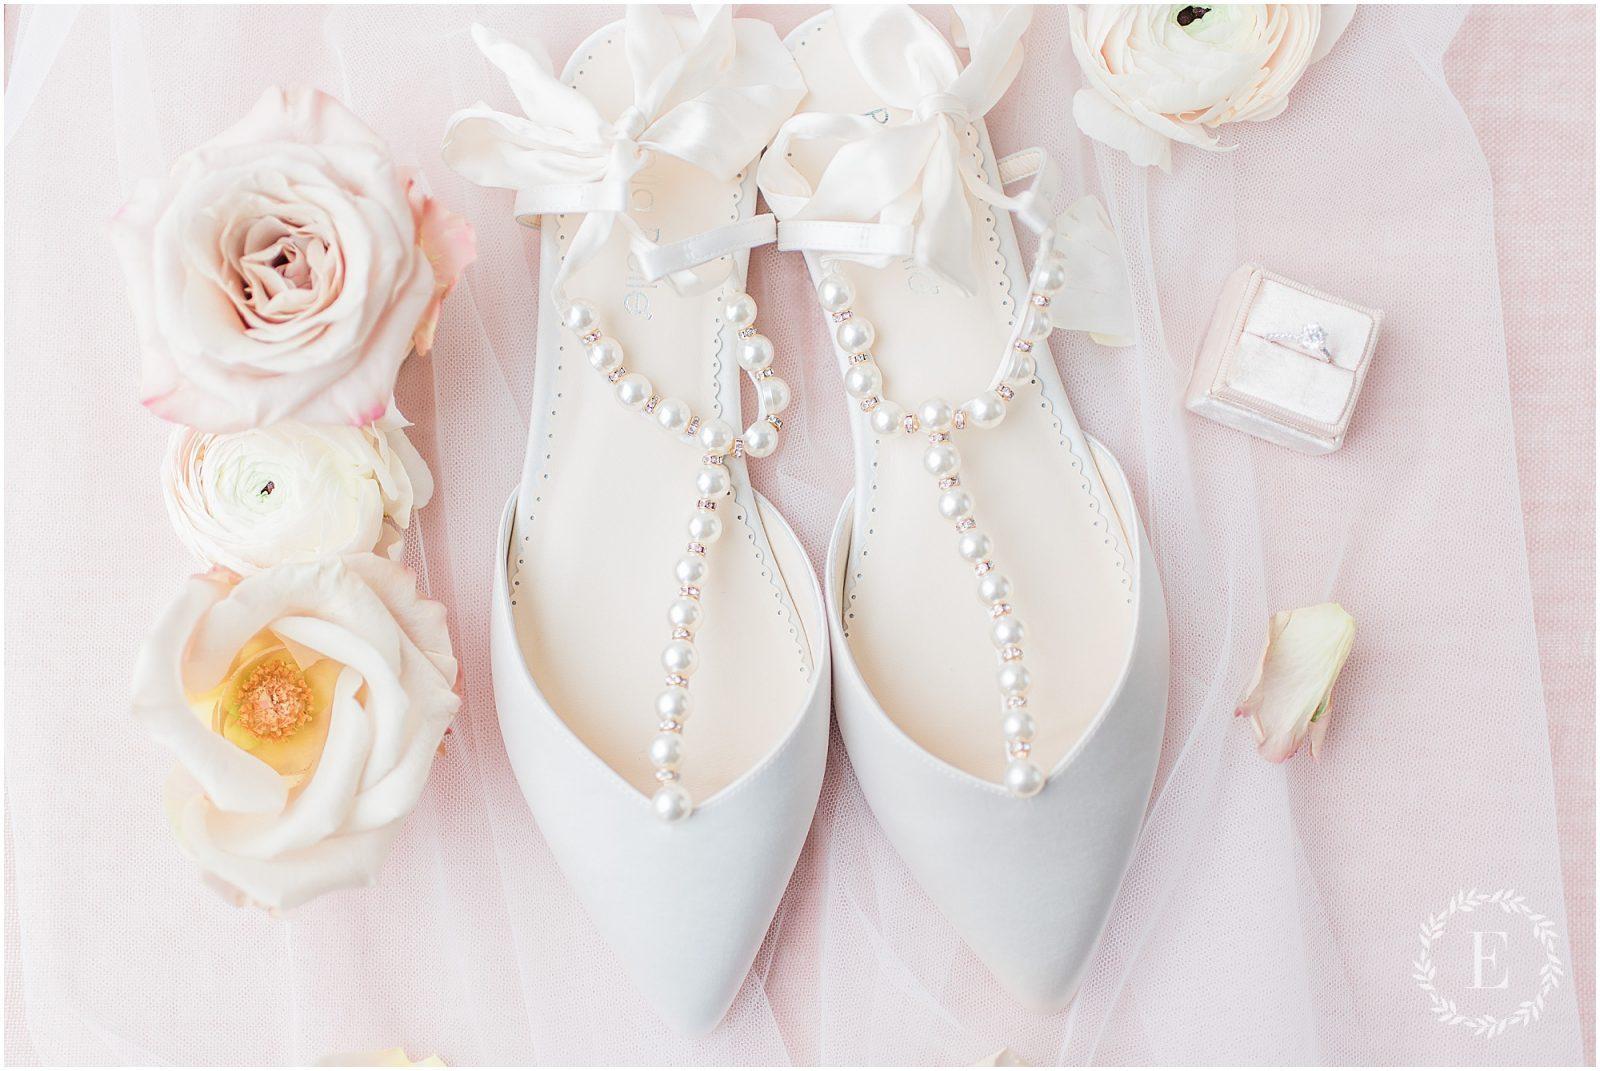 32 - Bella Belle for Fairy Dreams Bridal - PhotosbyEmmaH 2019.jpg